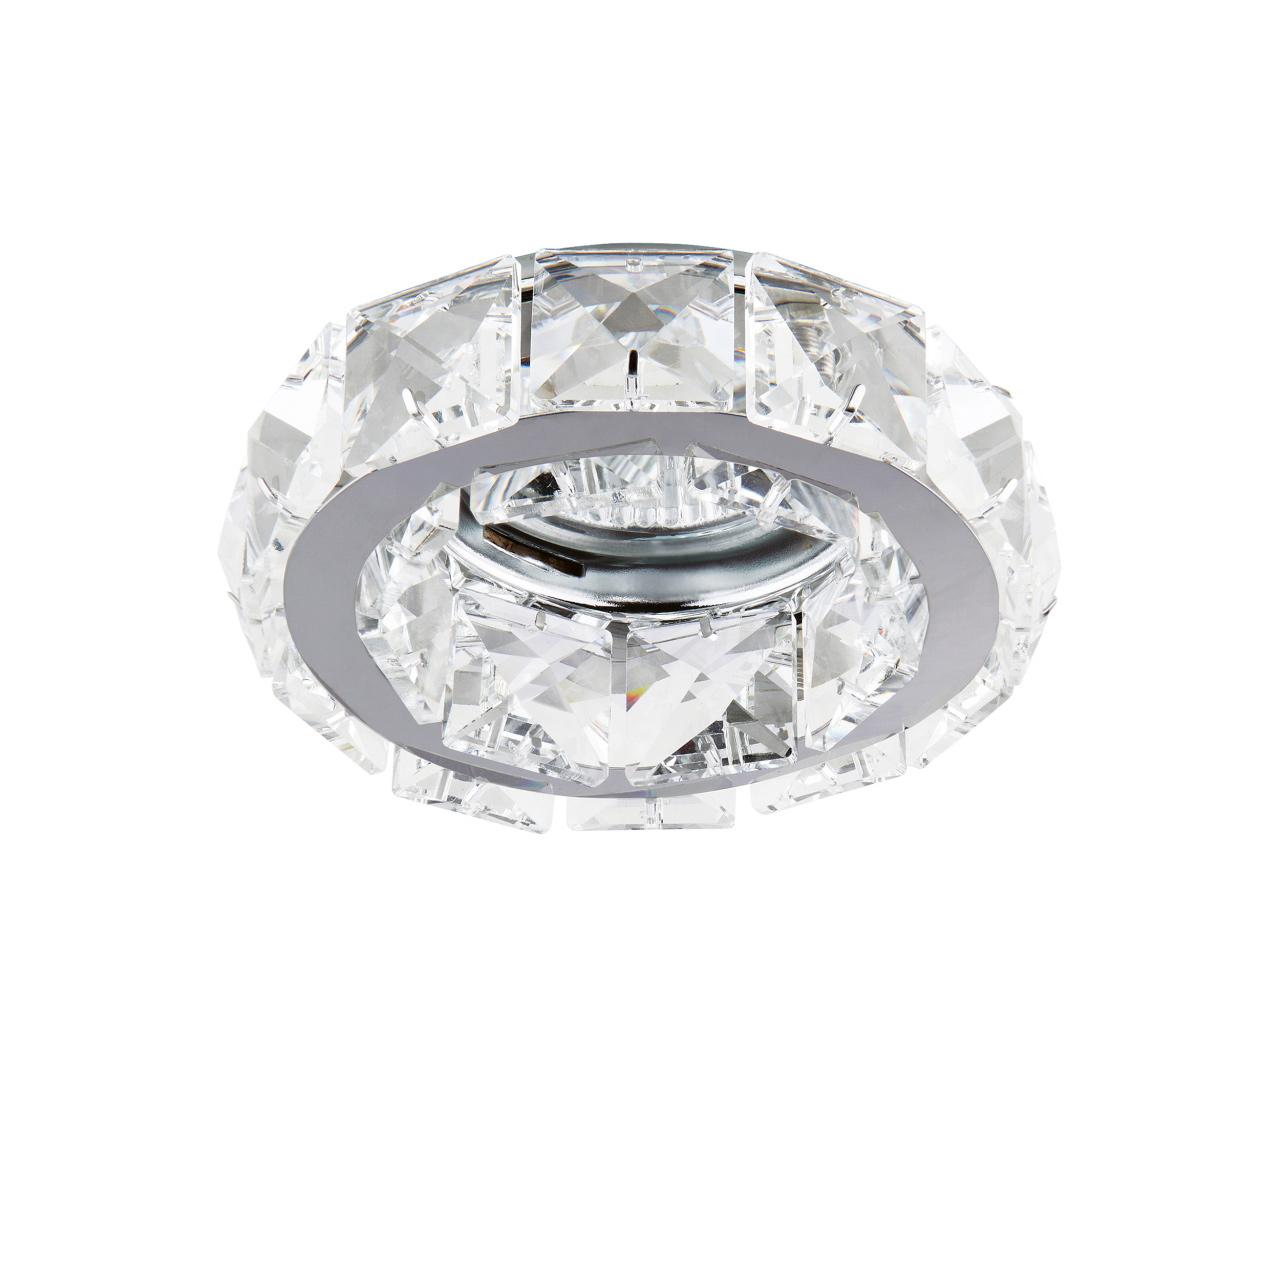 Светильник Onda MR16 / HP16 хром / хрусталь прозрачный Lightstar 032704